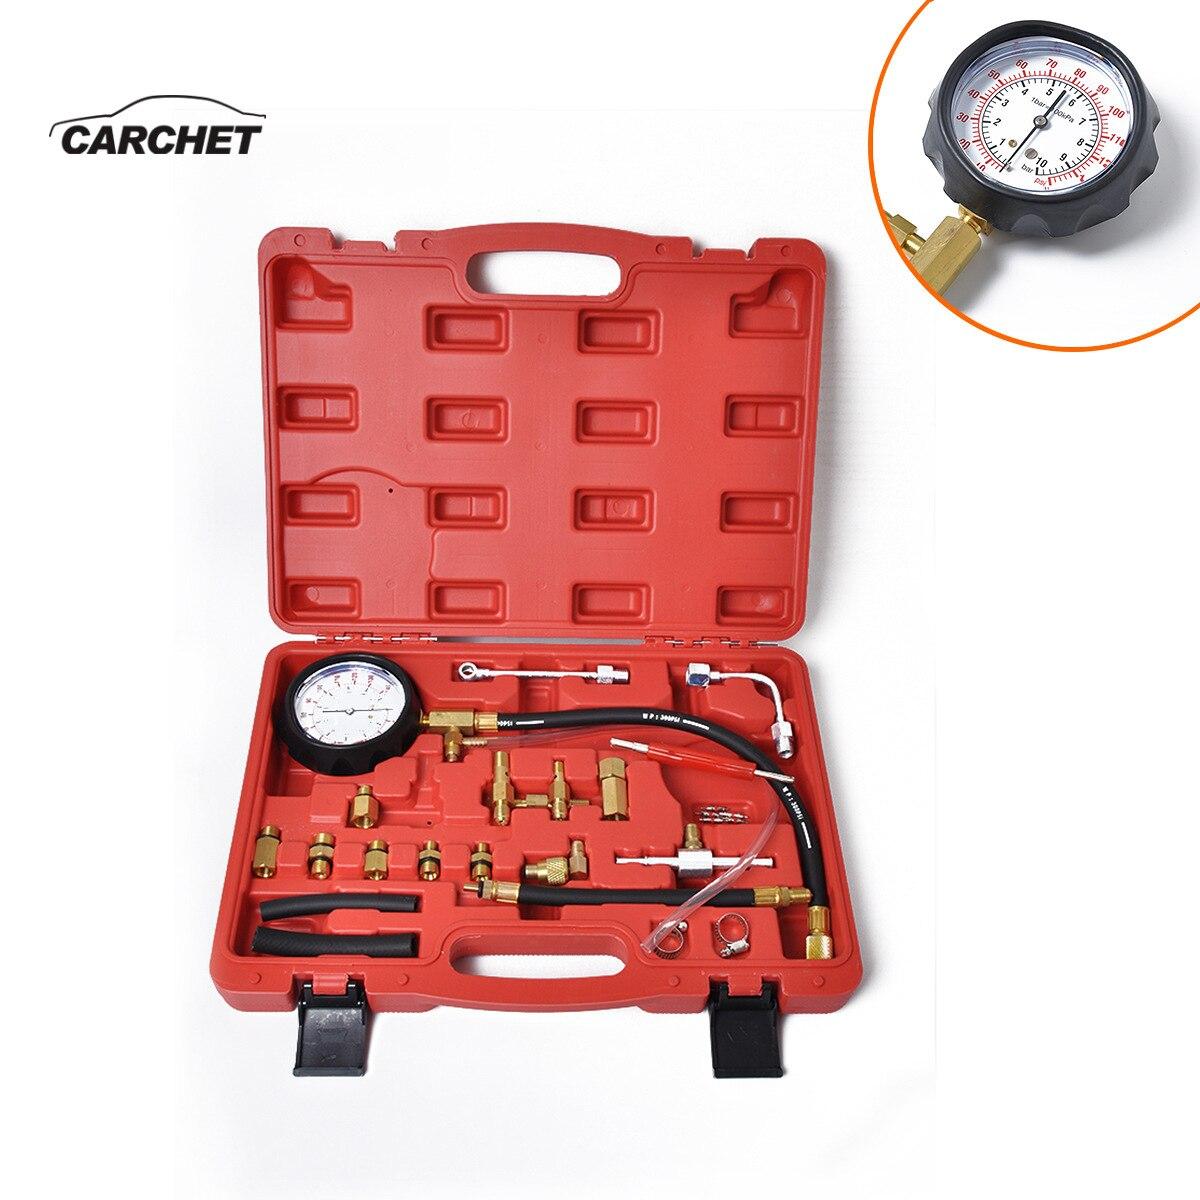 CAECHET Car Professional Fuel System Testing Gauge Set Fuel Pressure Tester Diagnostic Tools Valve Core + Removal Tool Universal